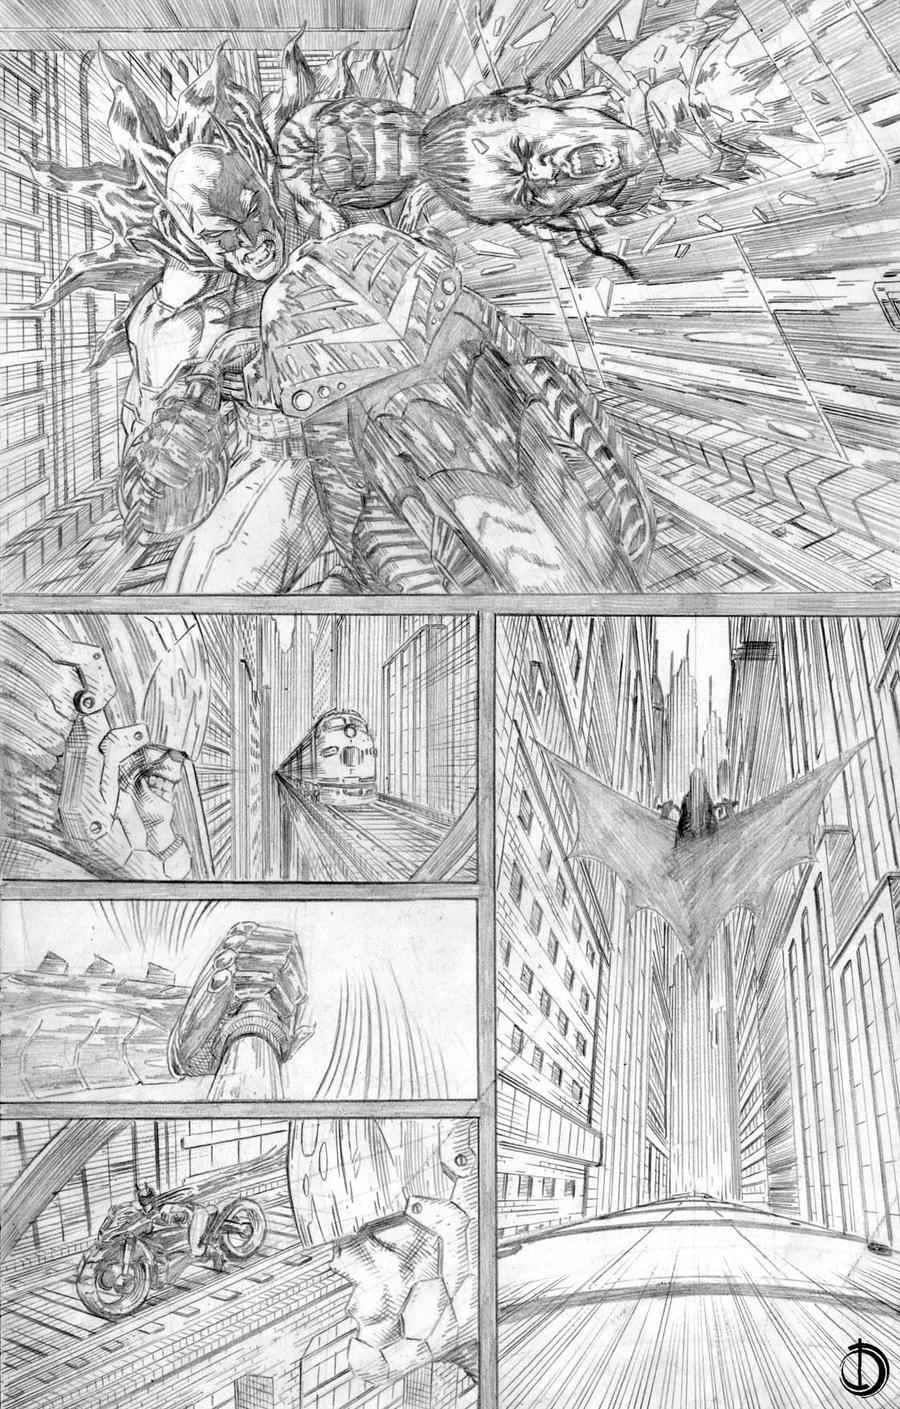 Batman Issue2 page4 by santiagocomics